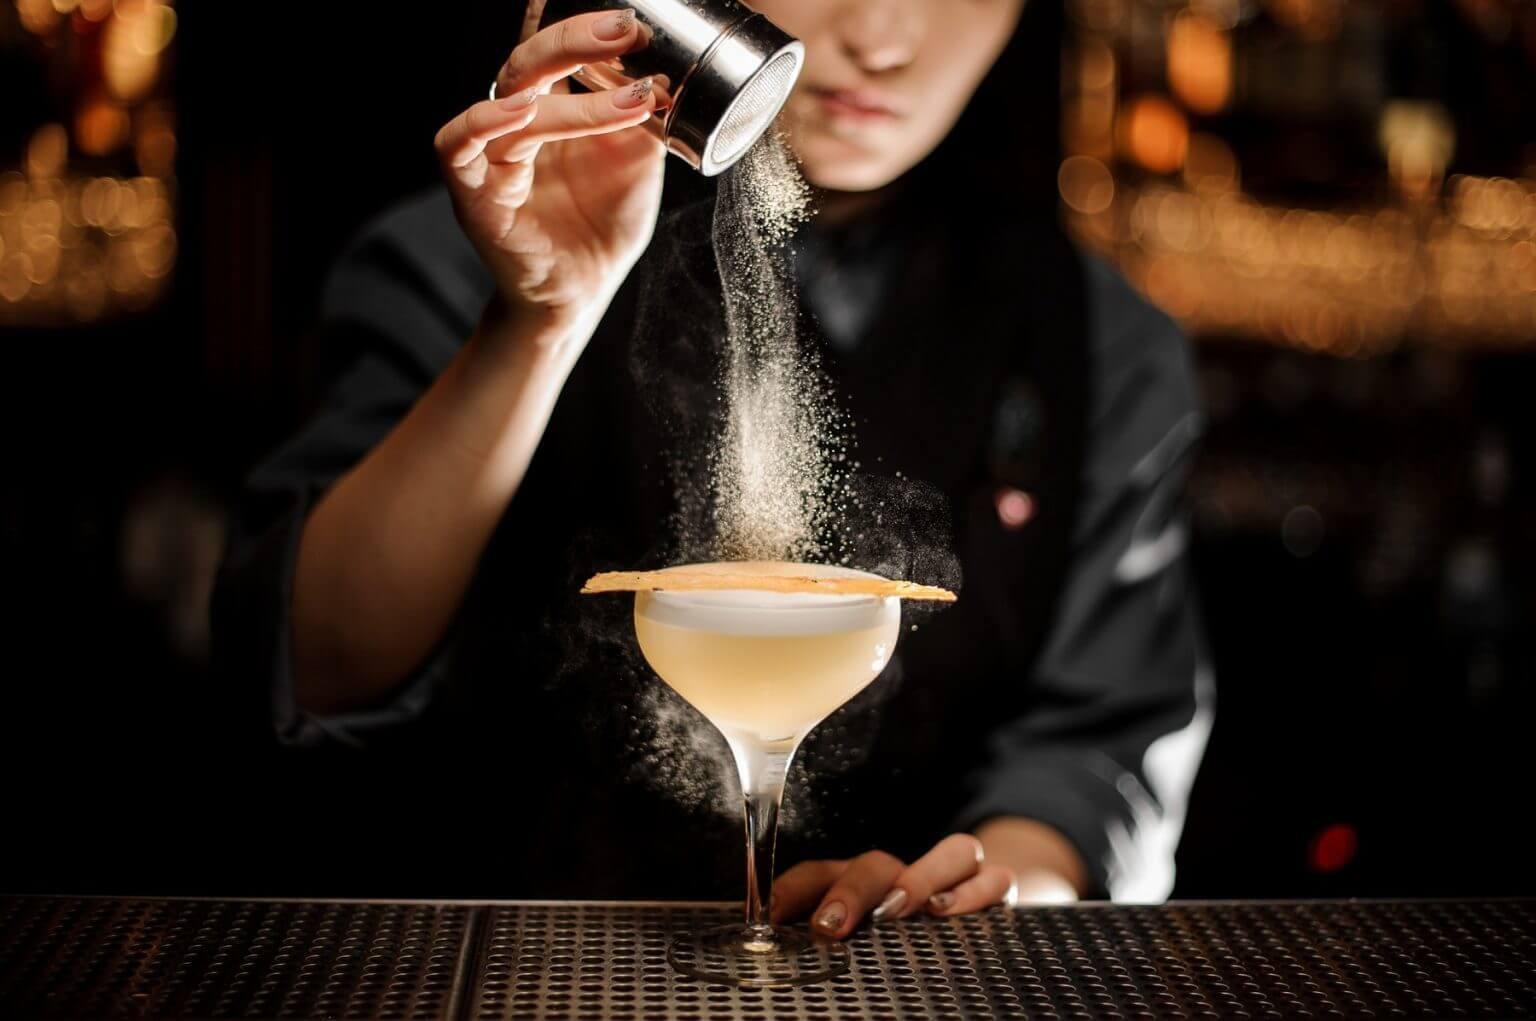 craft cocktail being made at bar bartender